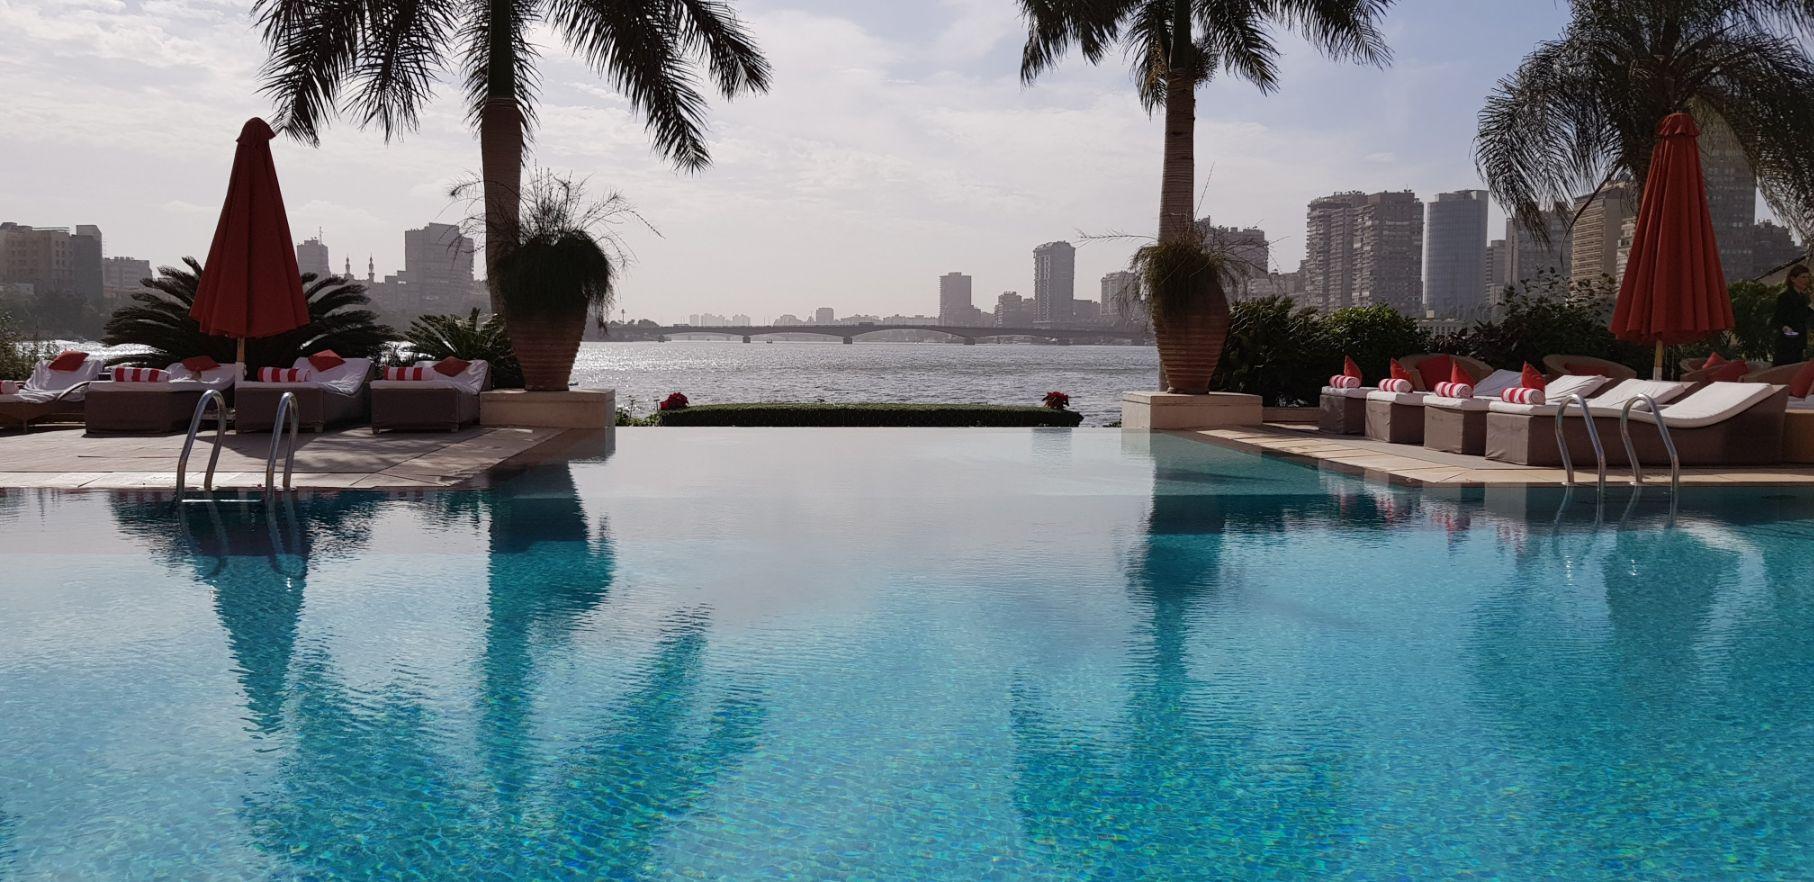 Hotel Sofitel Cairo Nile El Gezirah - Piscina com borda infinita